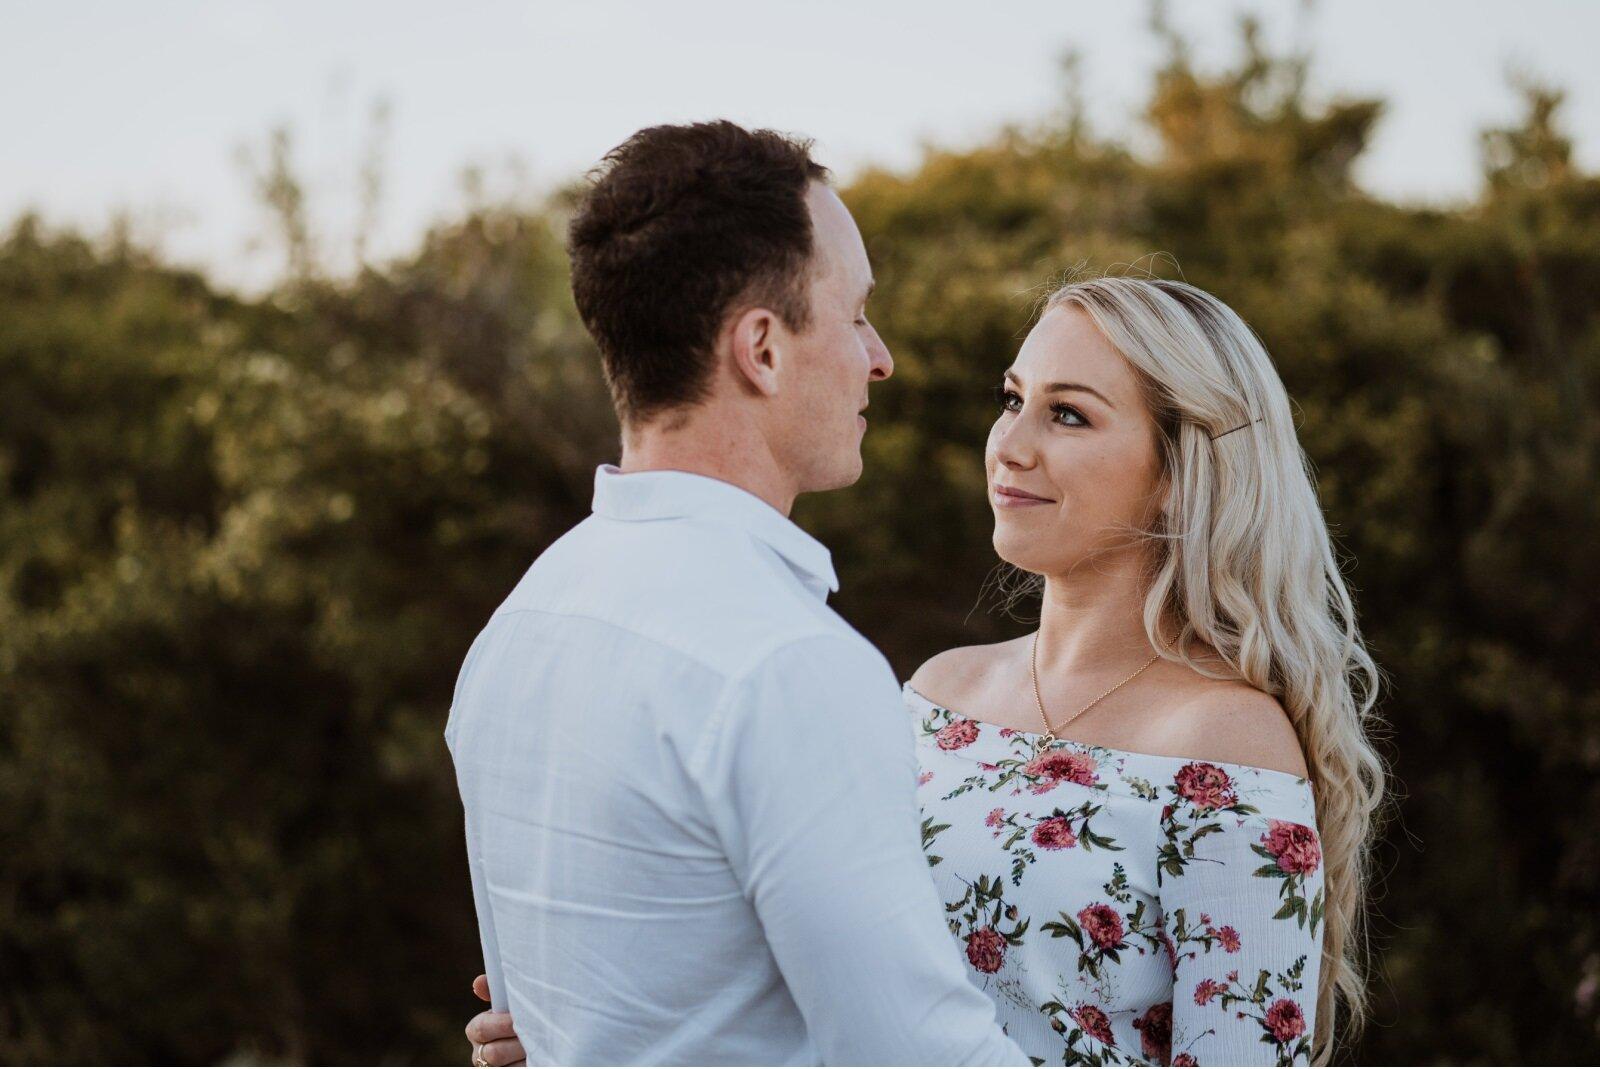 newcastle-wedding-photographer-dudley-engagement-shoot-16.jpg